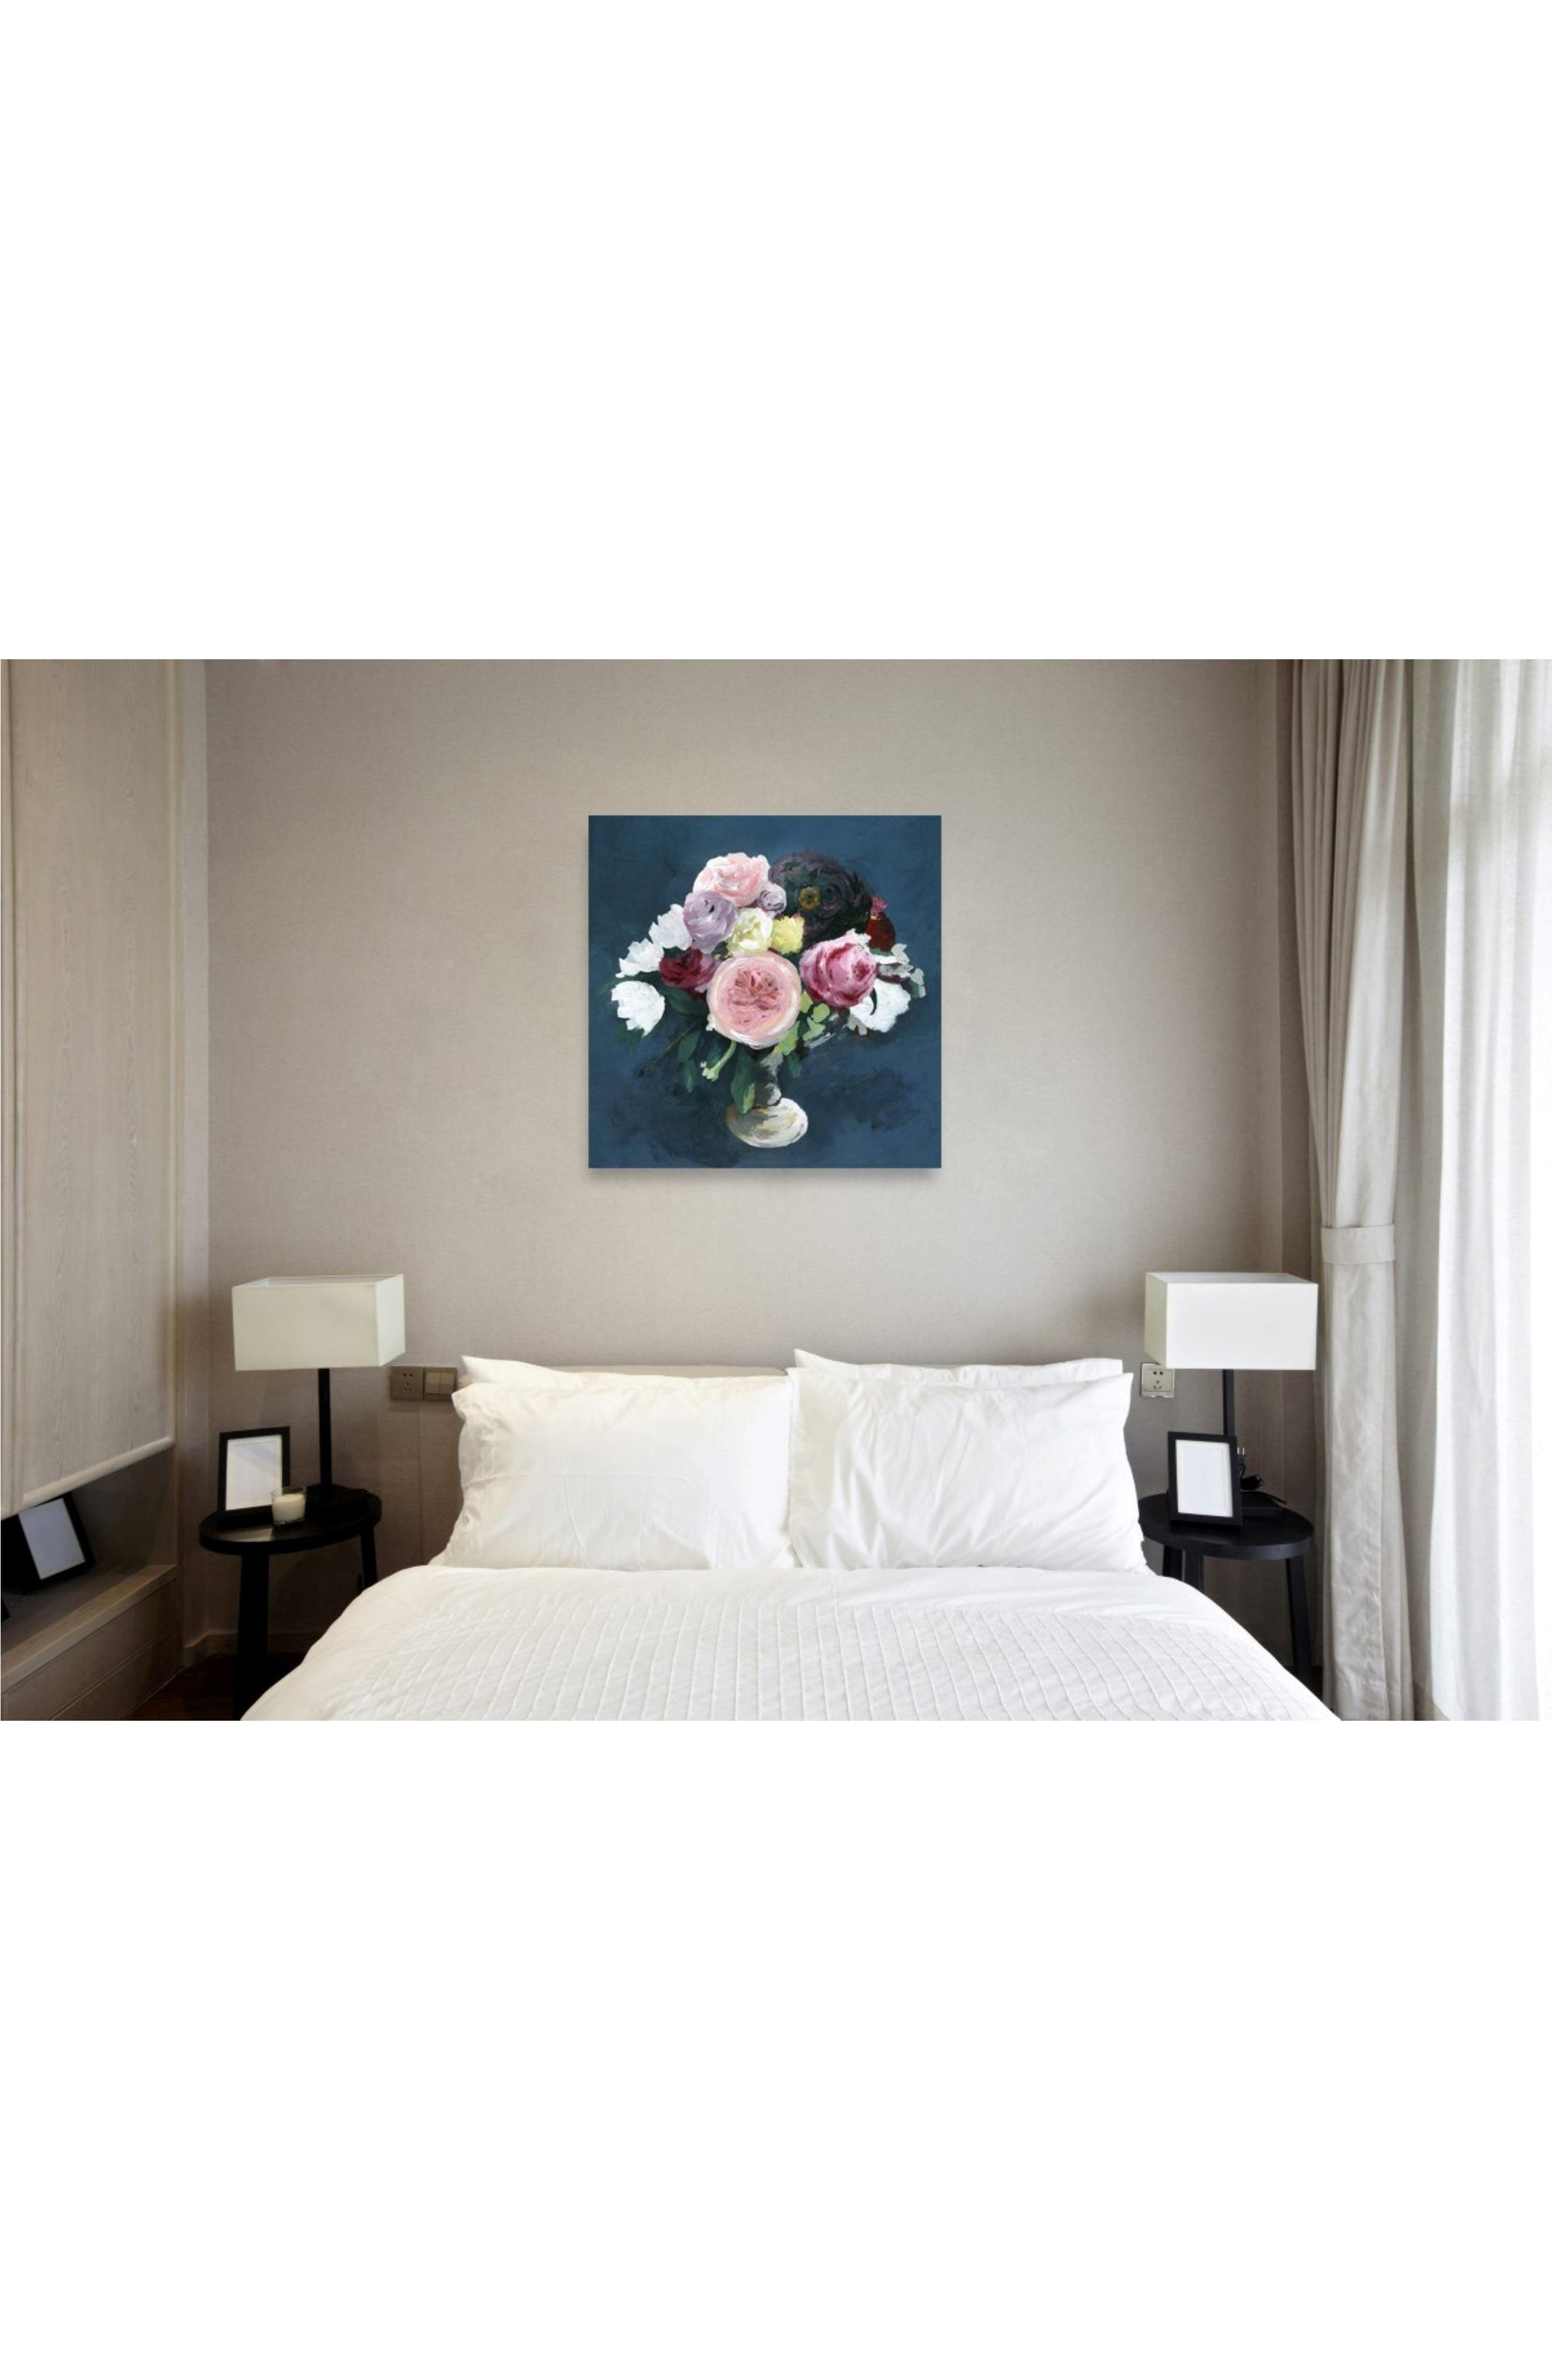 Night Bouquet Canvas Wall Art,                             Alternate thumbnail 2, color,                             BLUE